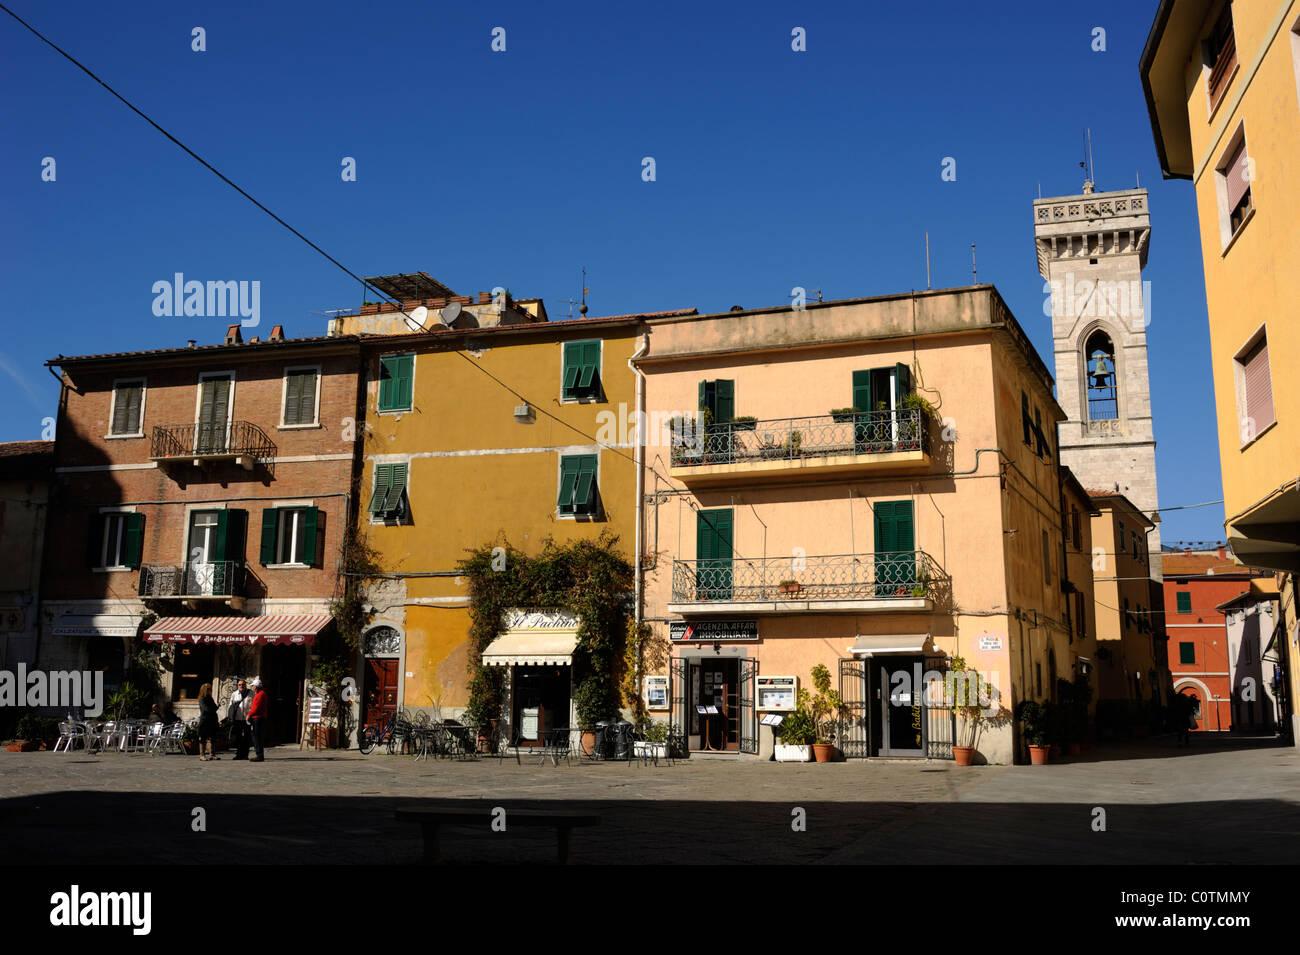 italy, tuscany, orbetello, old town - Stock Image